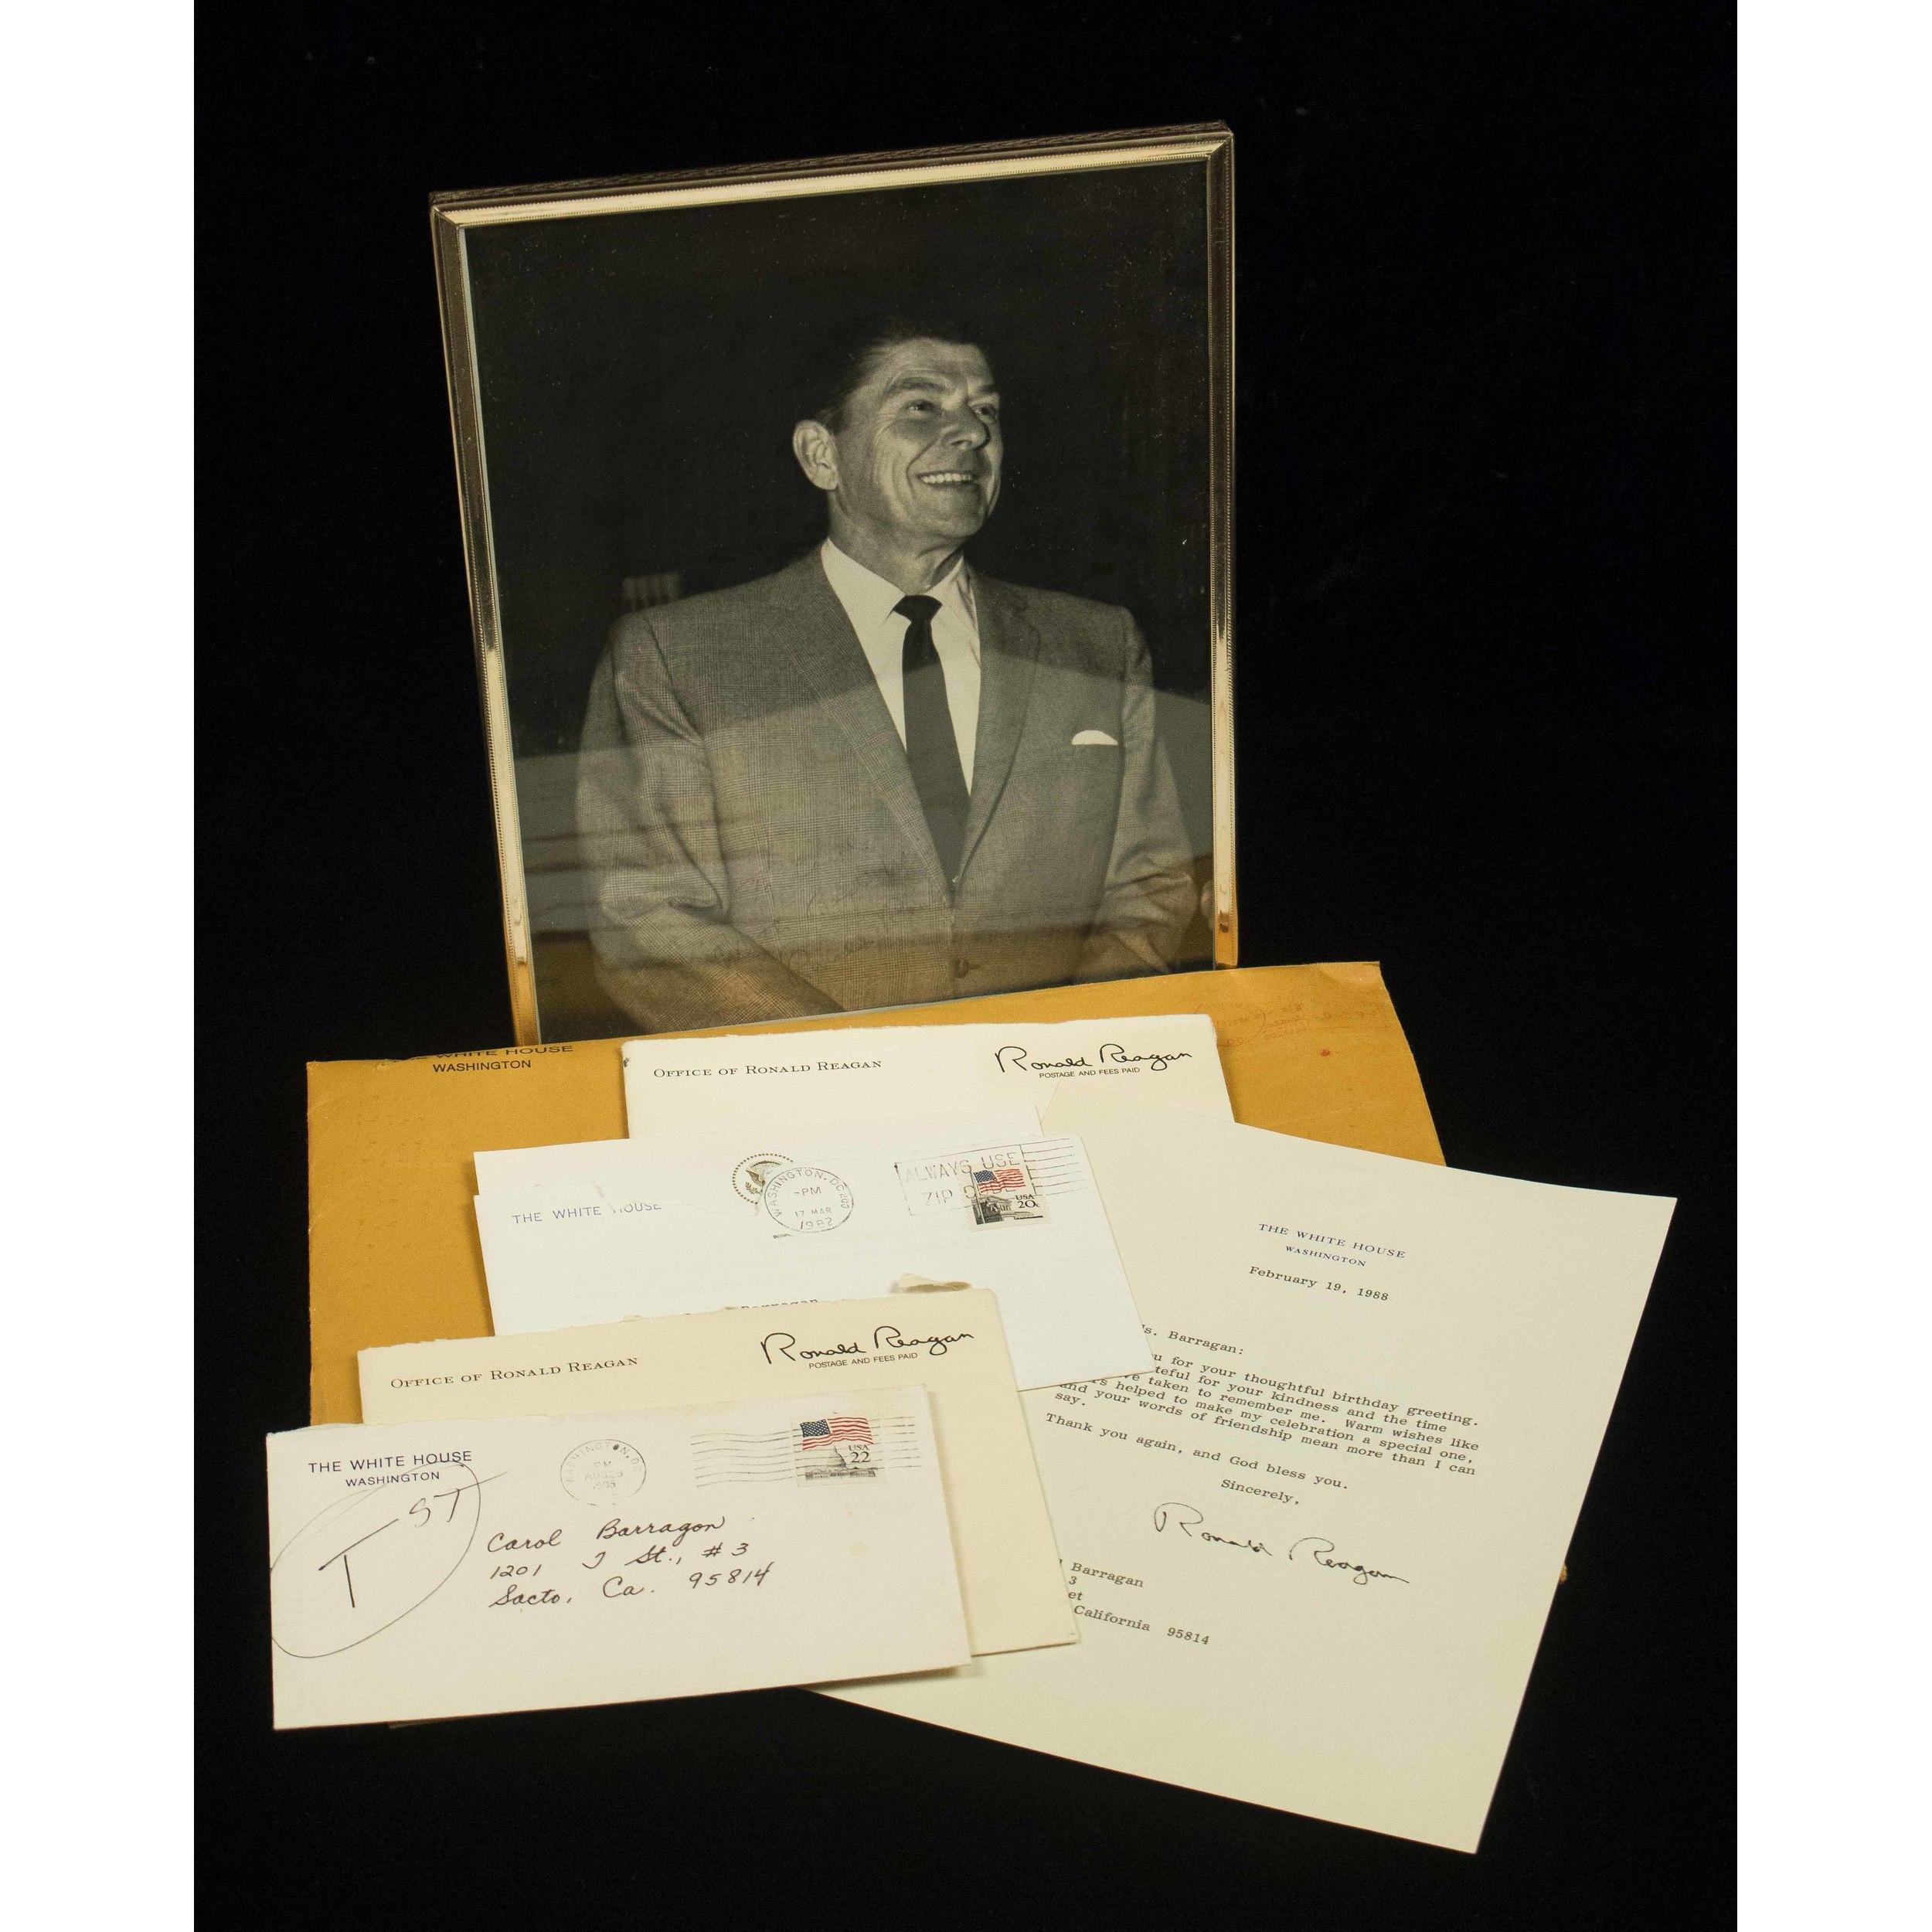 Ronald Reagan Memorabilia Witherells Auction House